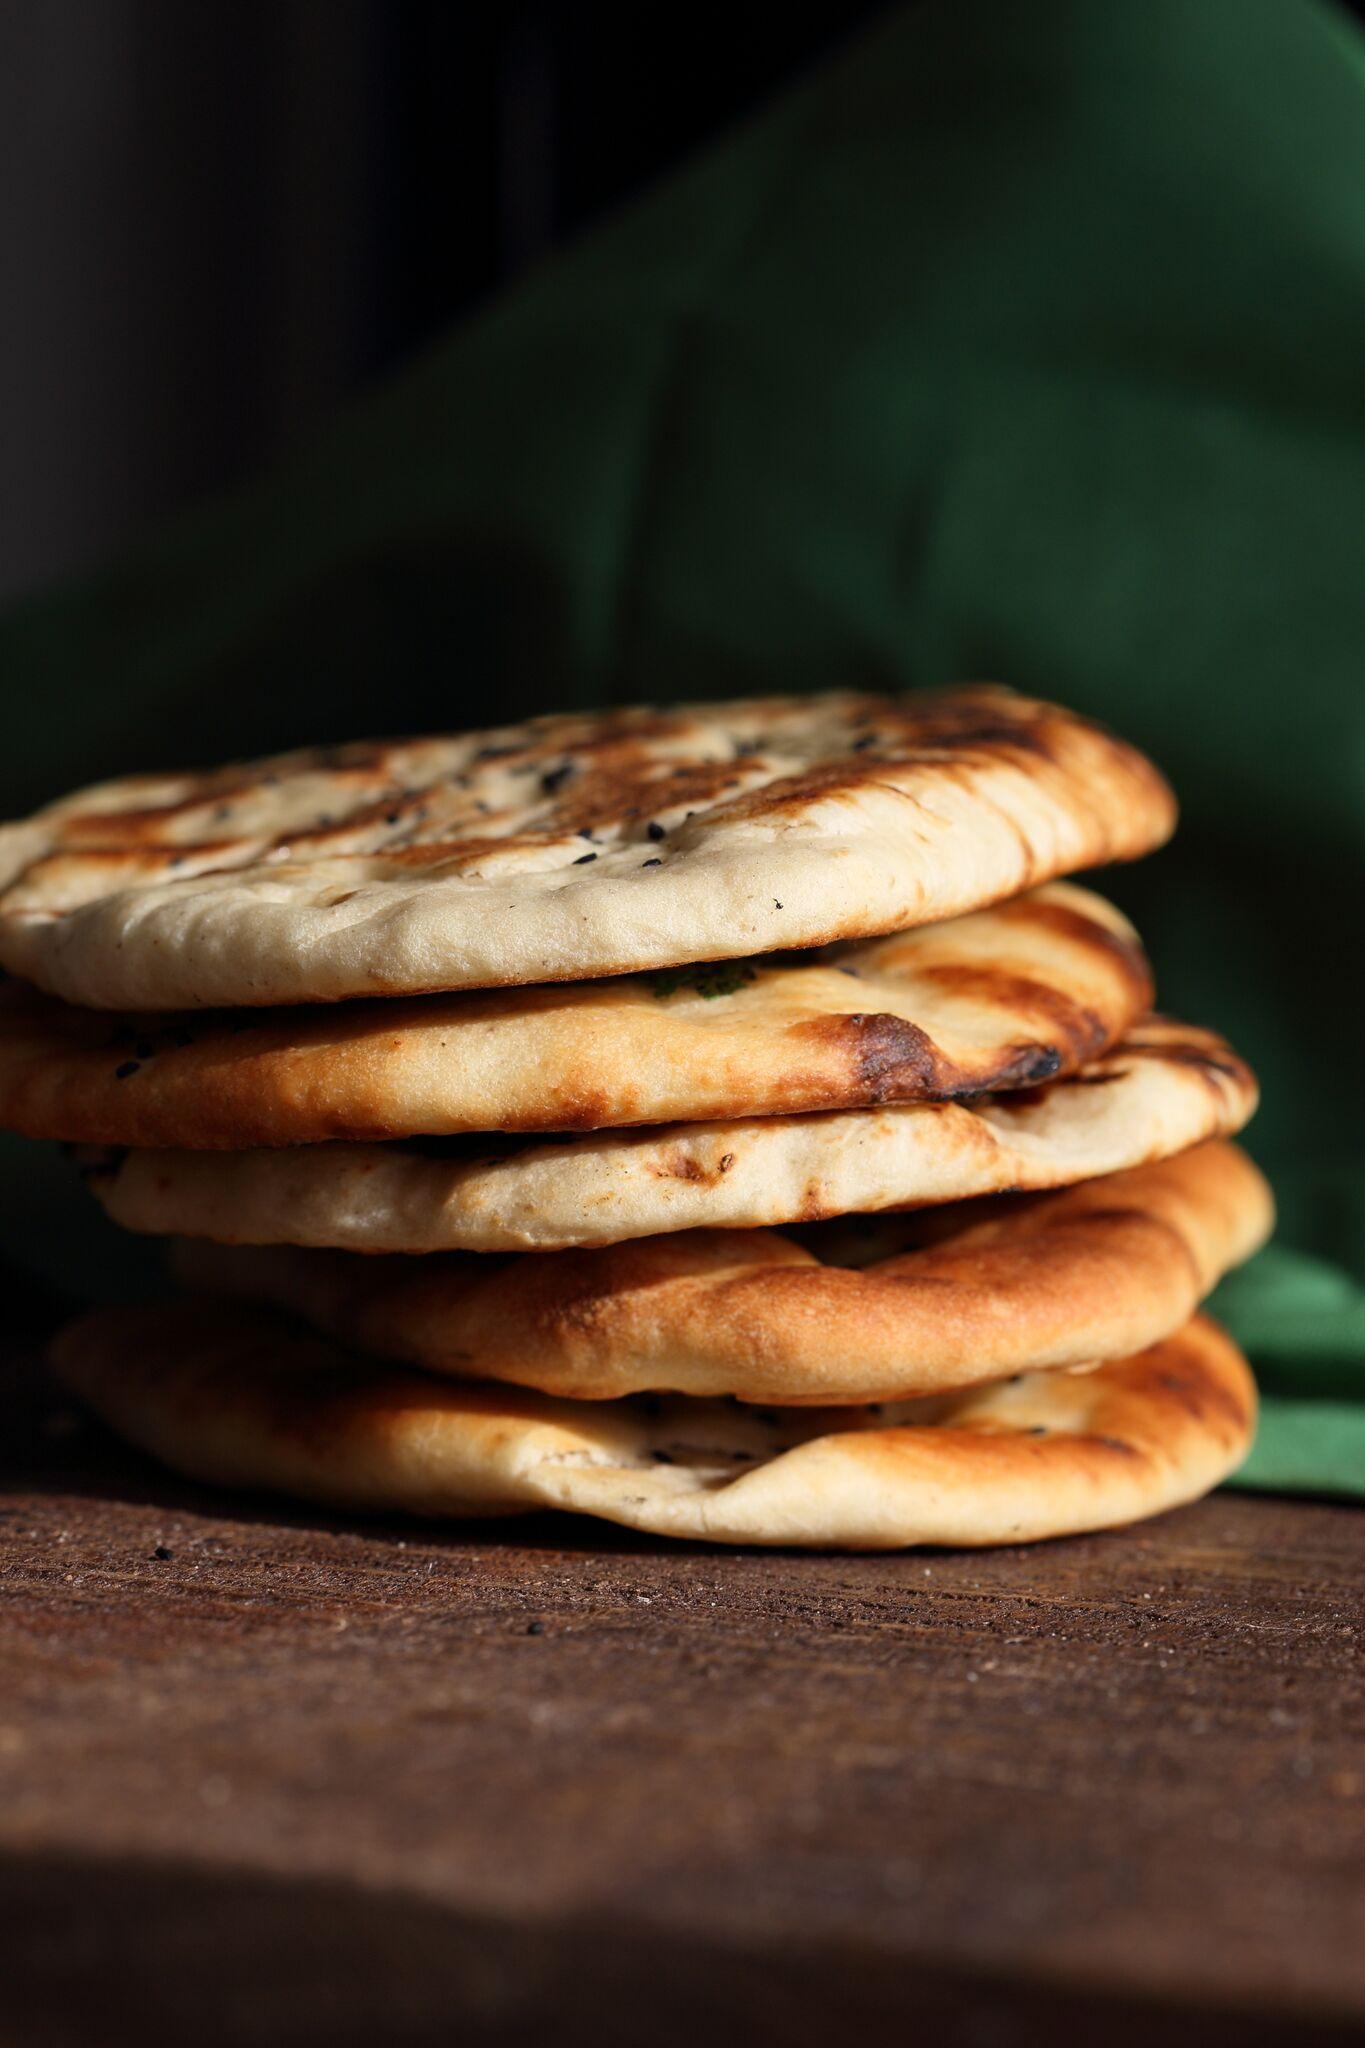 Vegan Naan Recipe Indian Naan Flatbread Garlic Naan Avoado Naan Vegan Veganricha Veganrichasindiankitchen Ve Vegan Recipes Healthy Vegan Recipes Recipes